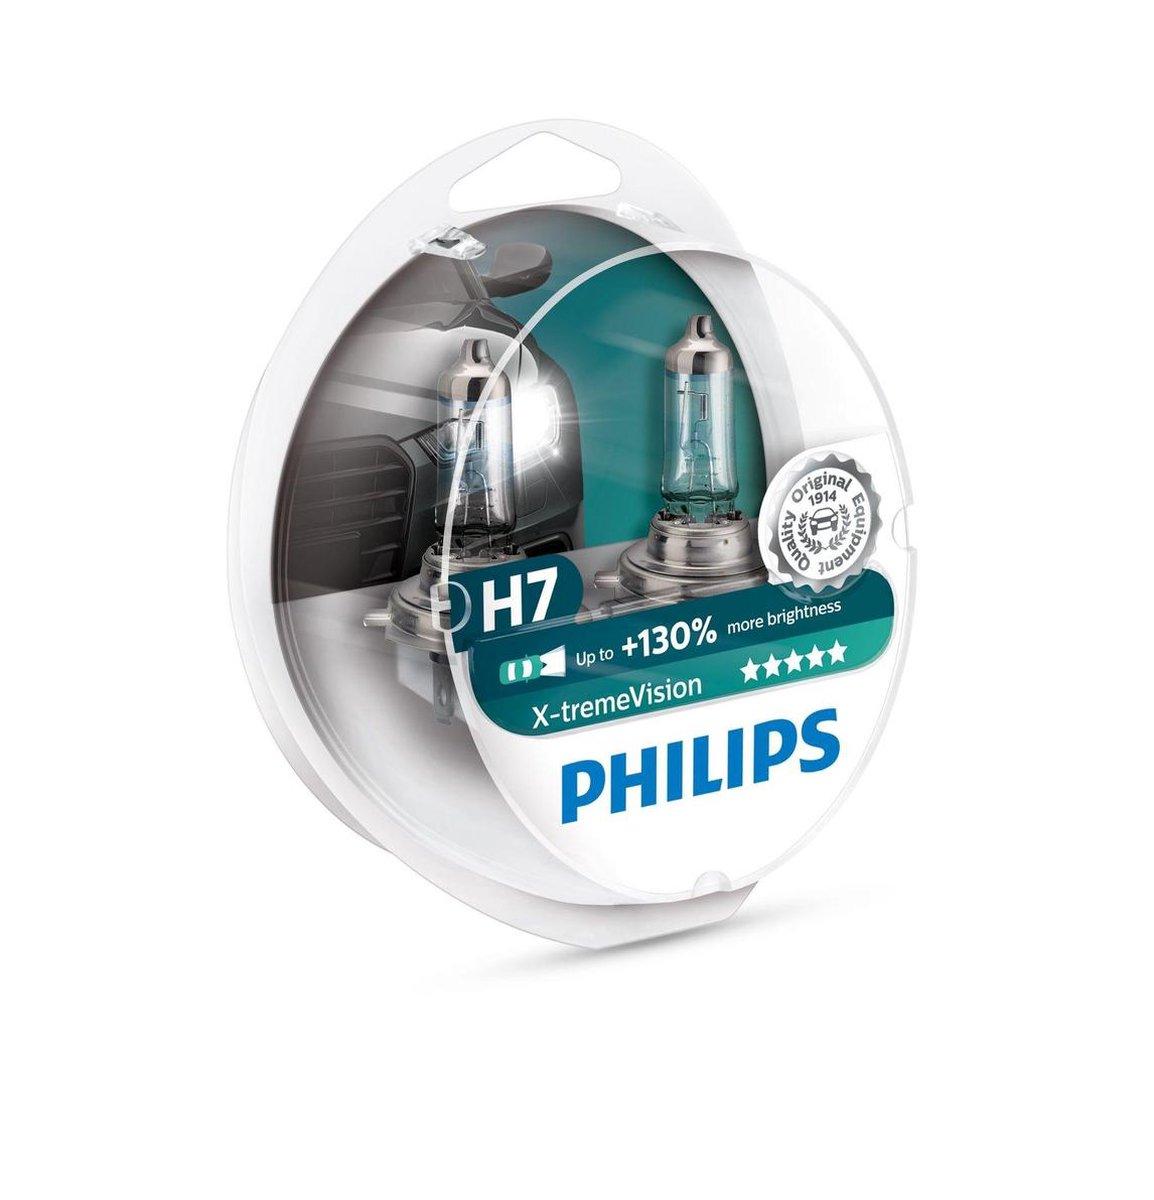 Philips X-tremeVision 12972XV+S2 autolamp H7 55 W Halogeen